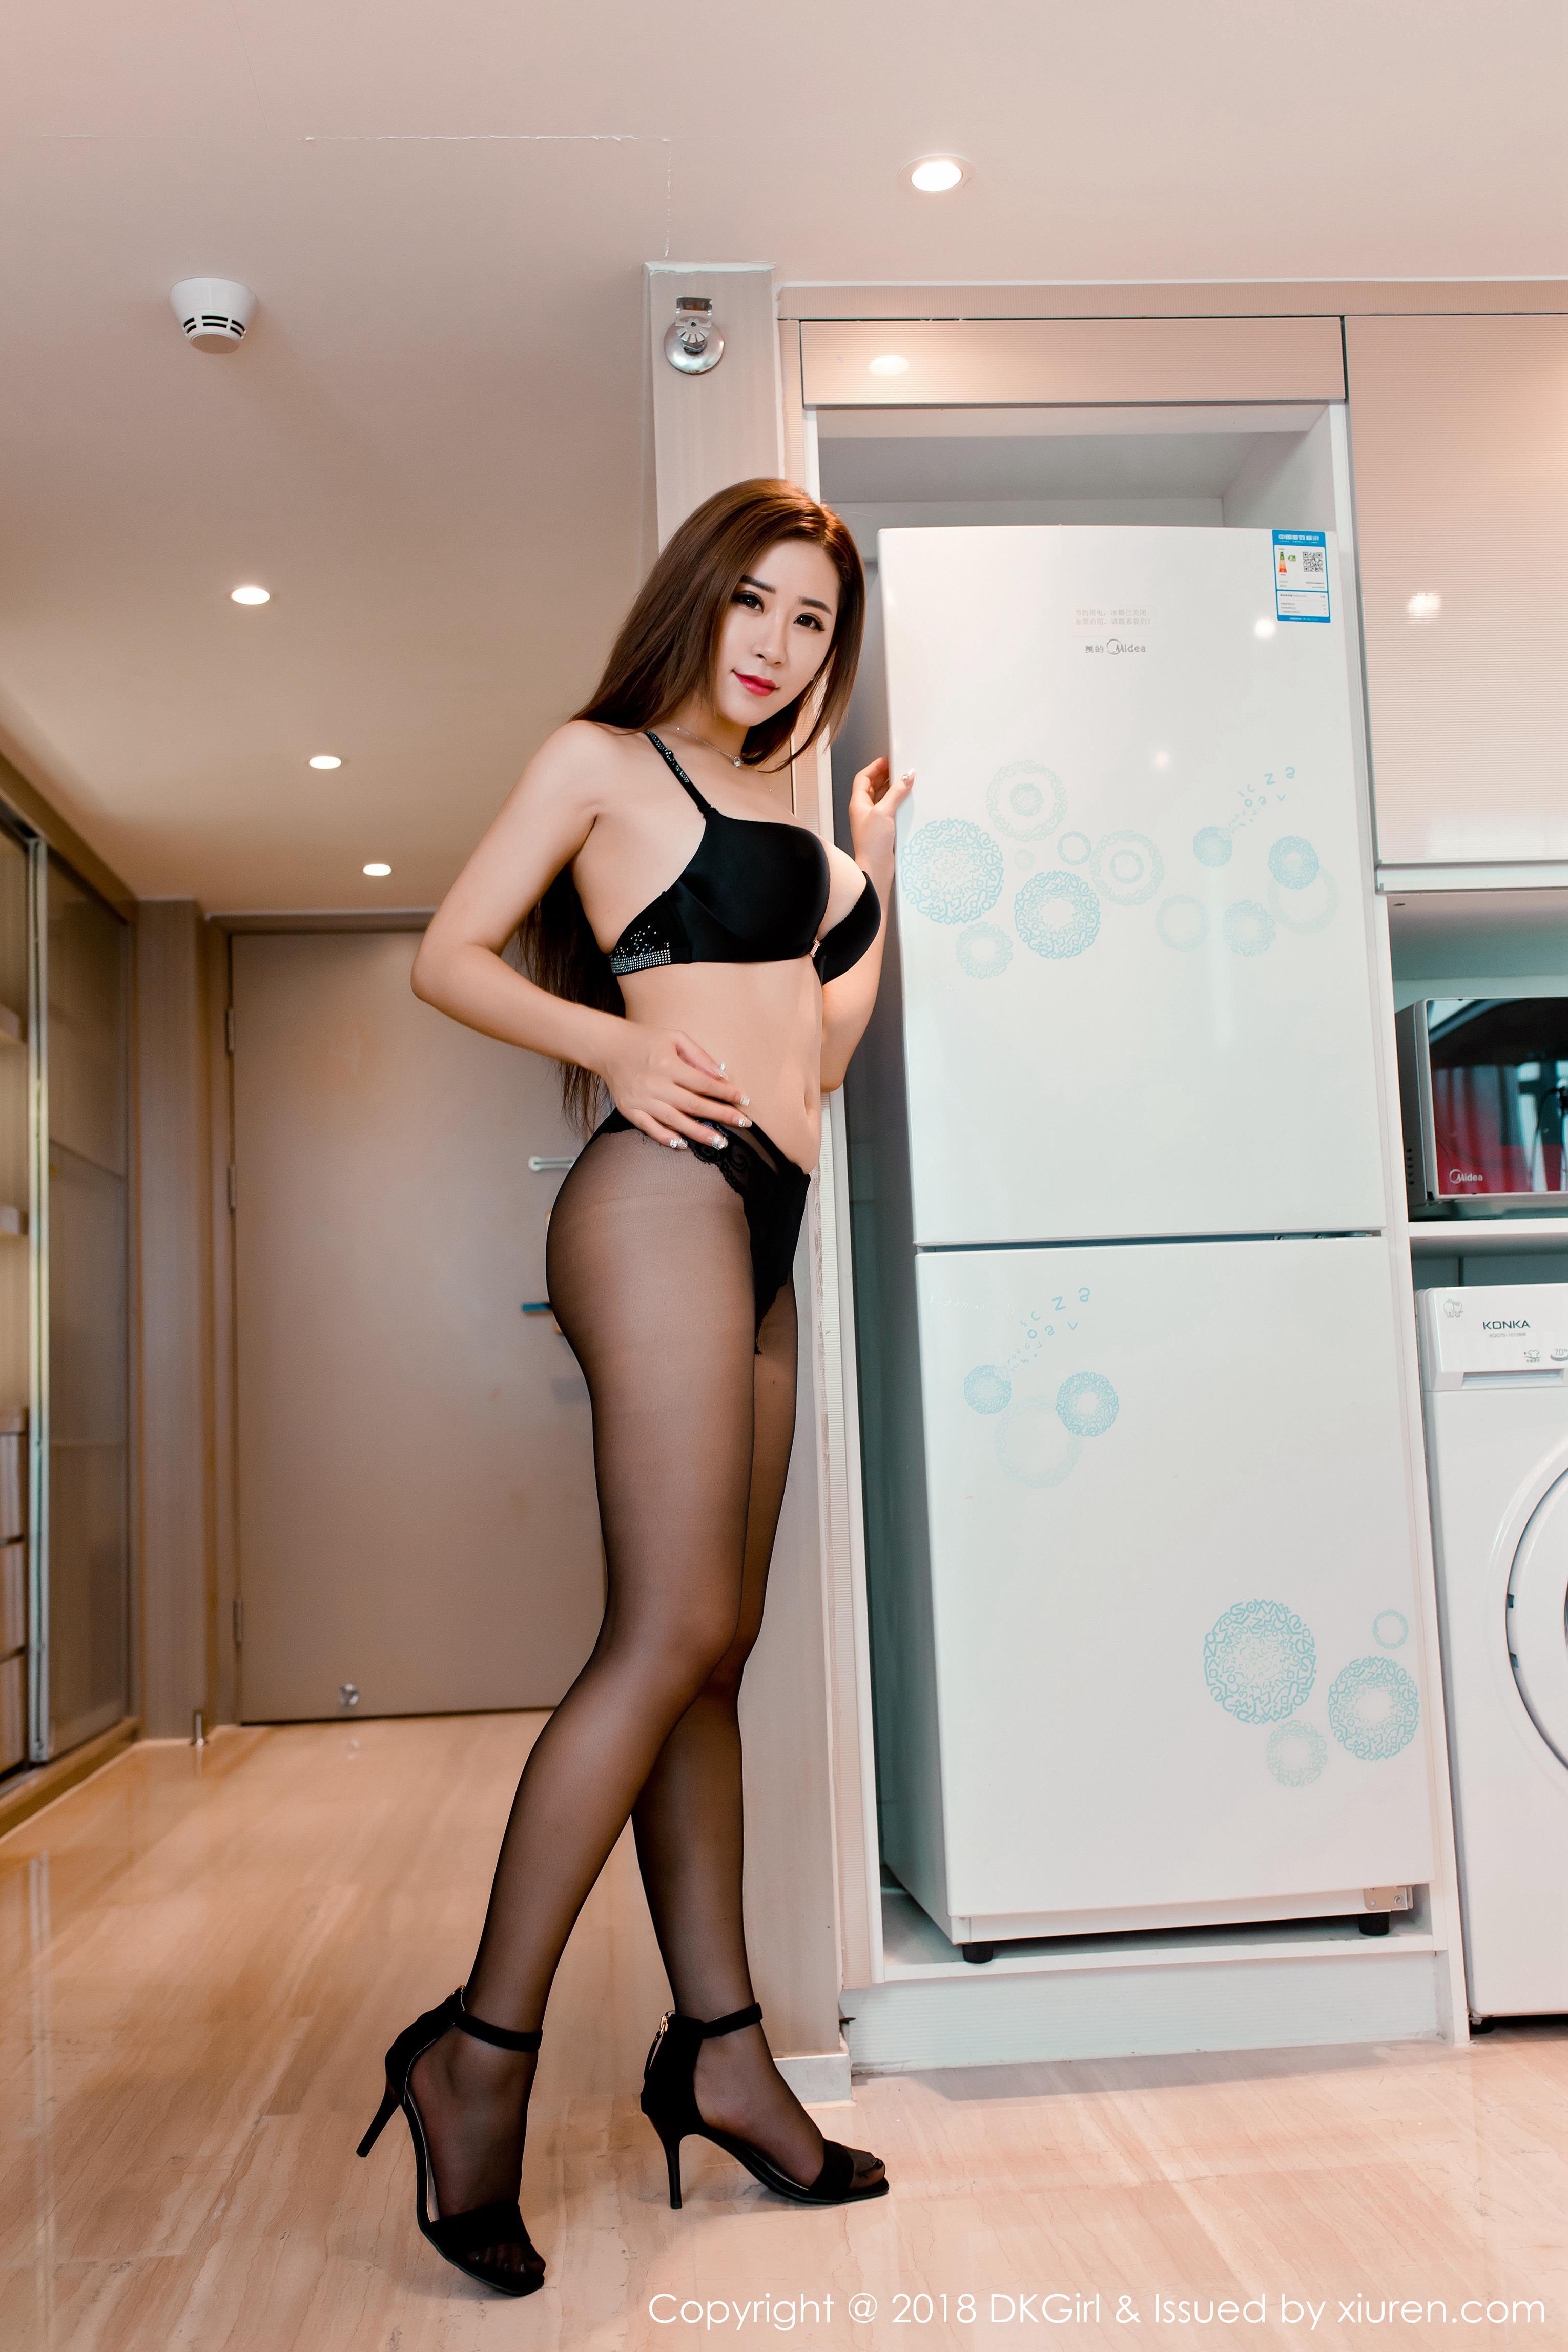 [DKGirl御女郎]DK20180928VOL0086 雪儿Cier 黑色内衣加黑色丝袜美腿与透视情趣旗袍性感私房写真集